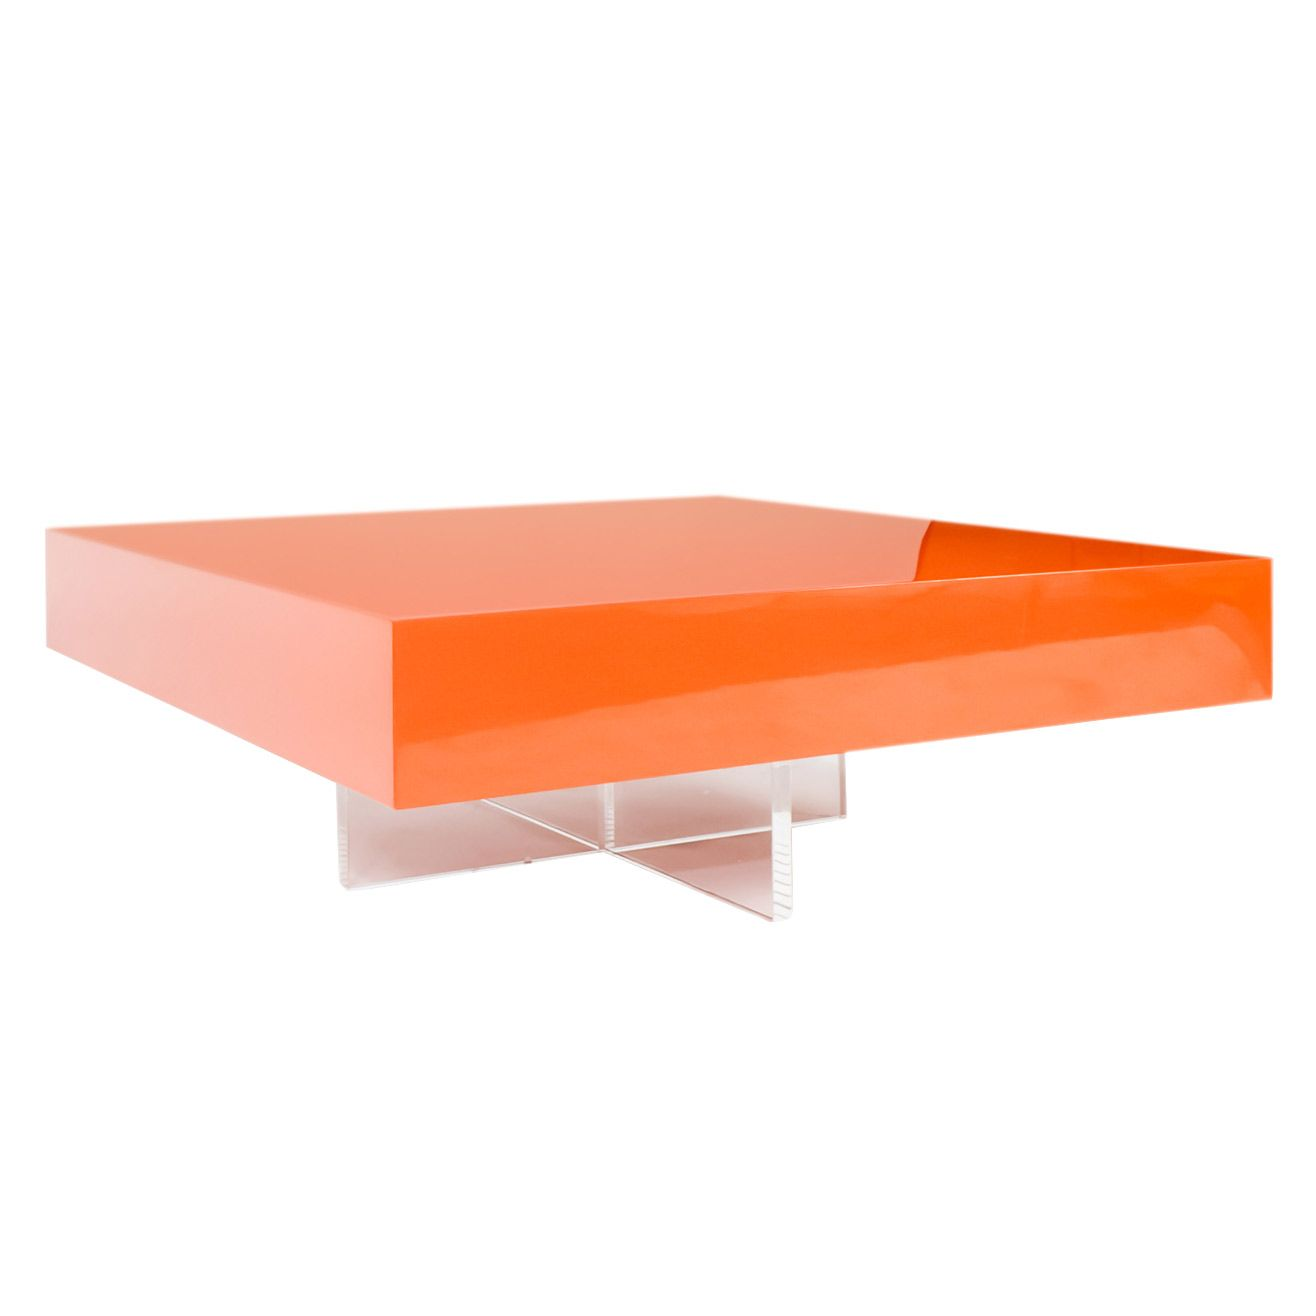 jonathan adler lacquer block orange cocktail table @zinc_door